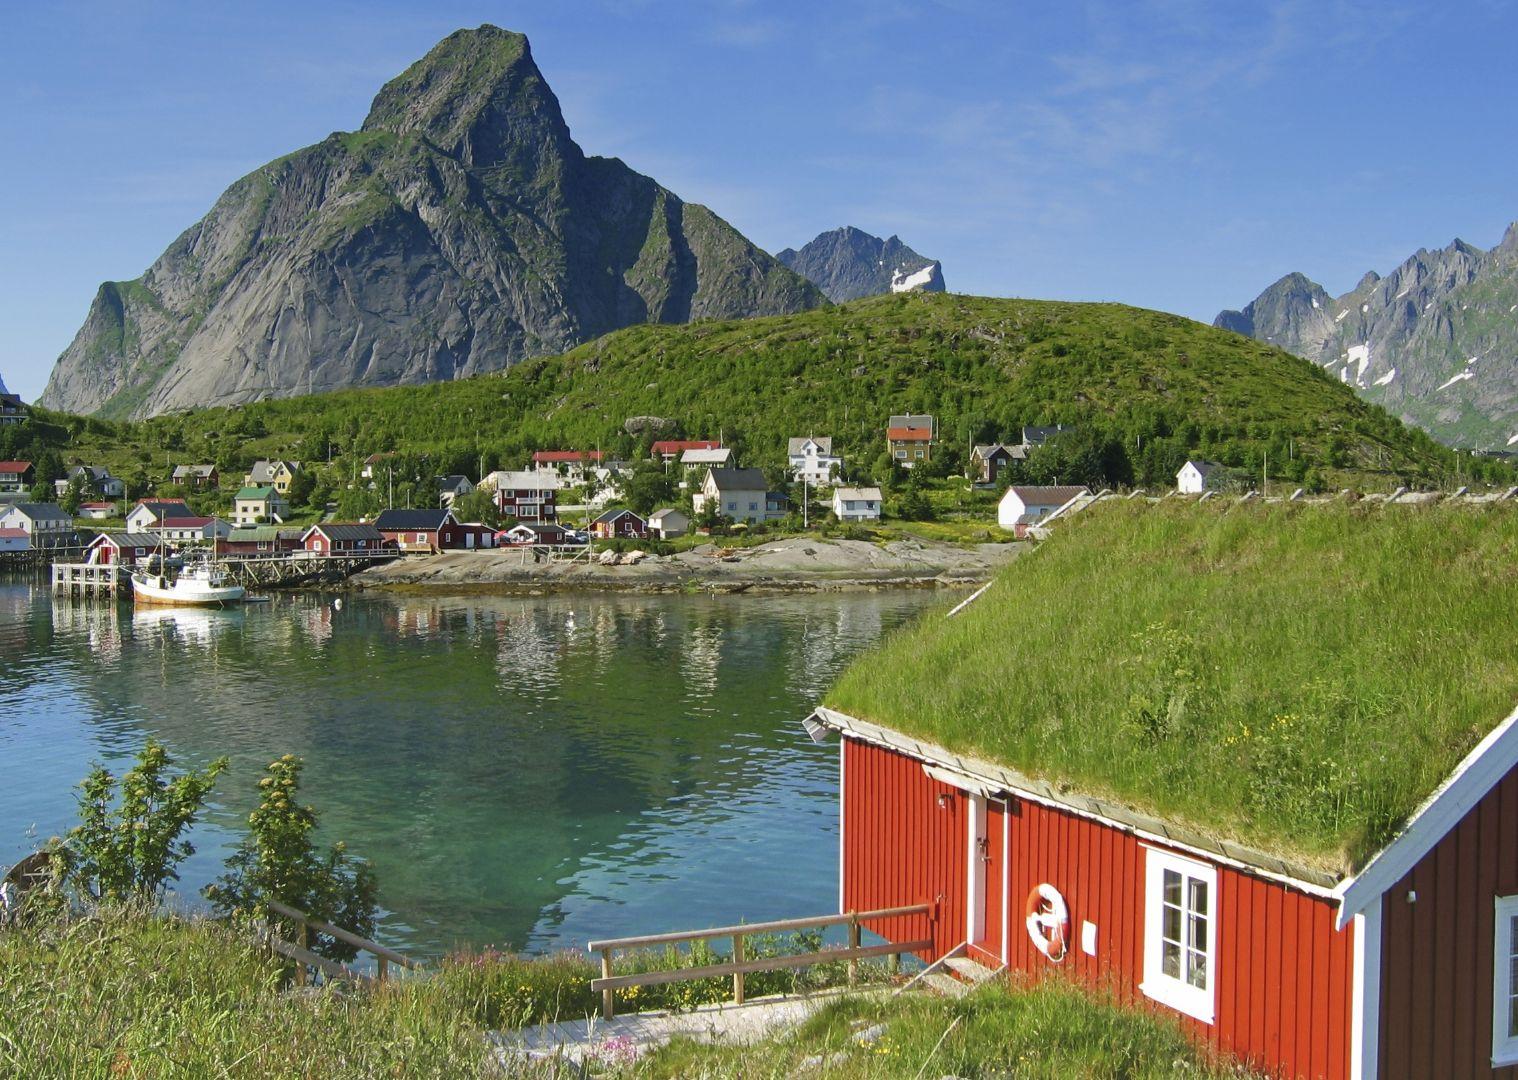 bigstockphoto_Island_Of_Moskenes_459629.jpg - Norway - Lofoten Islands - Self-Guided Leisure Cycling Holiday - Leisure Cycling